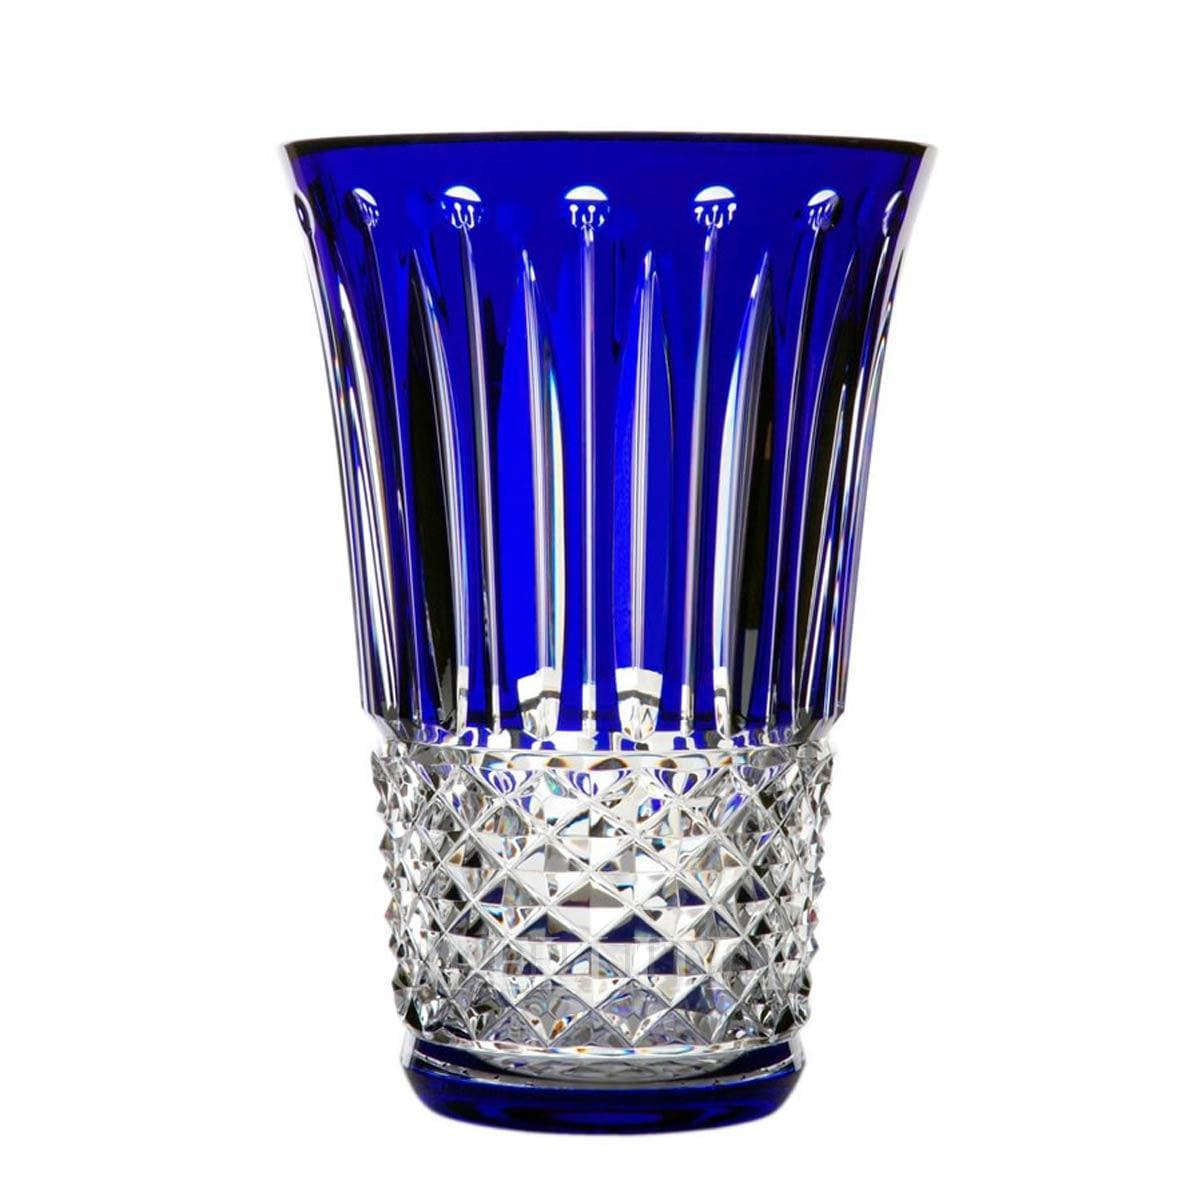 Vaso tommyssimo blu saint louis scopelliti 1887 for Vaso blu